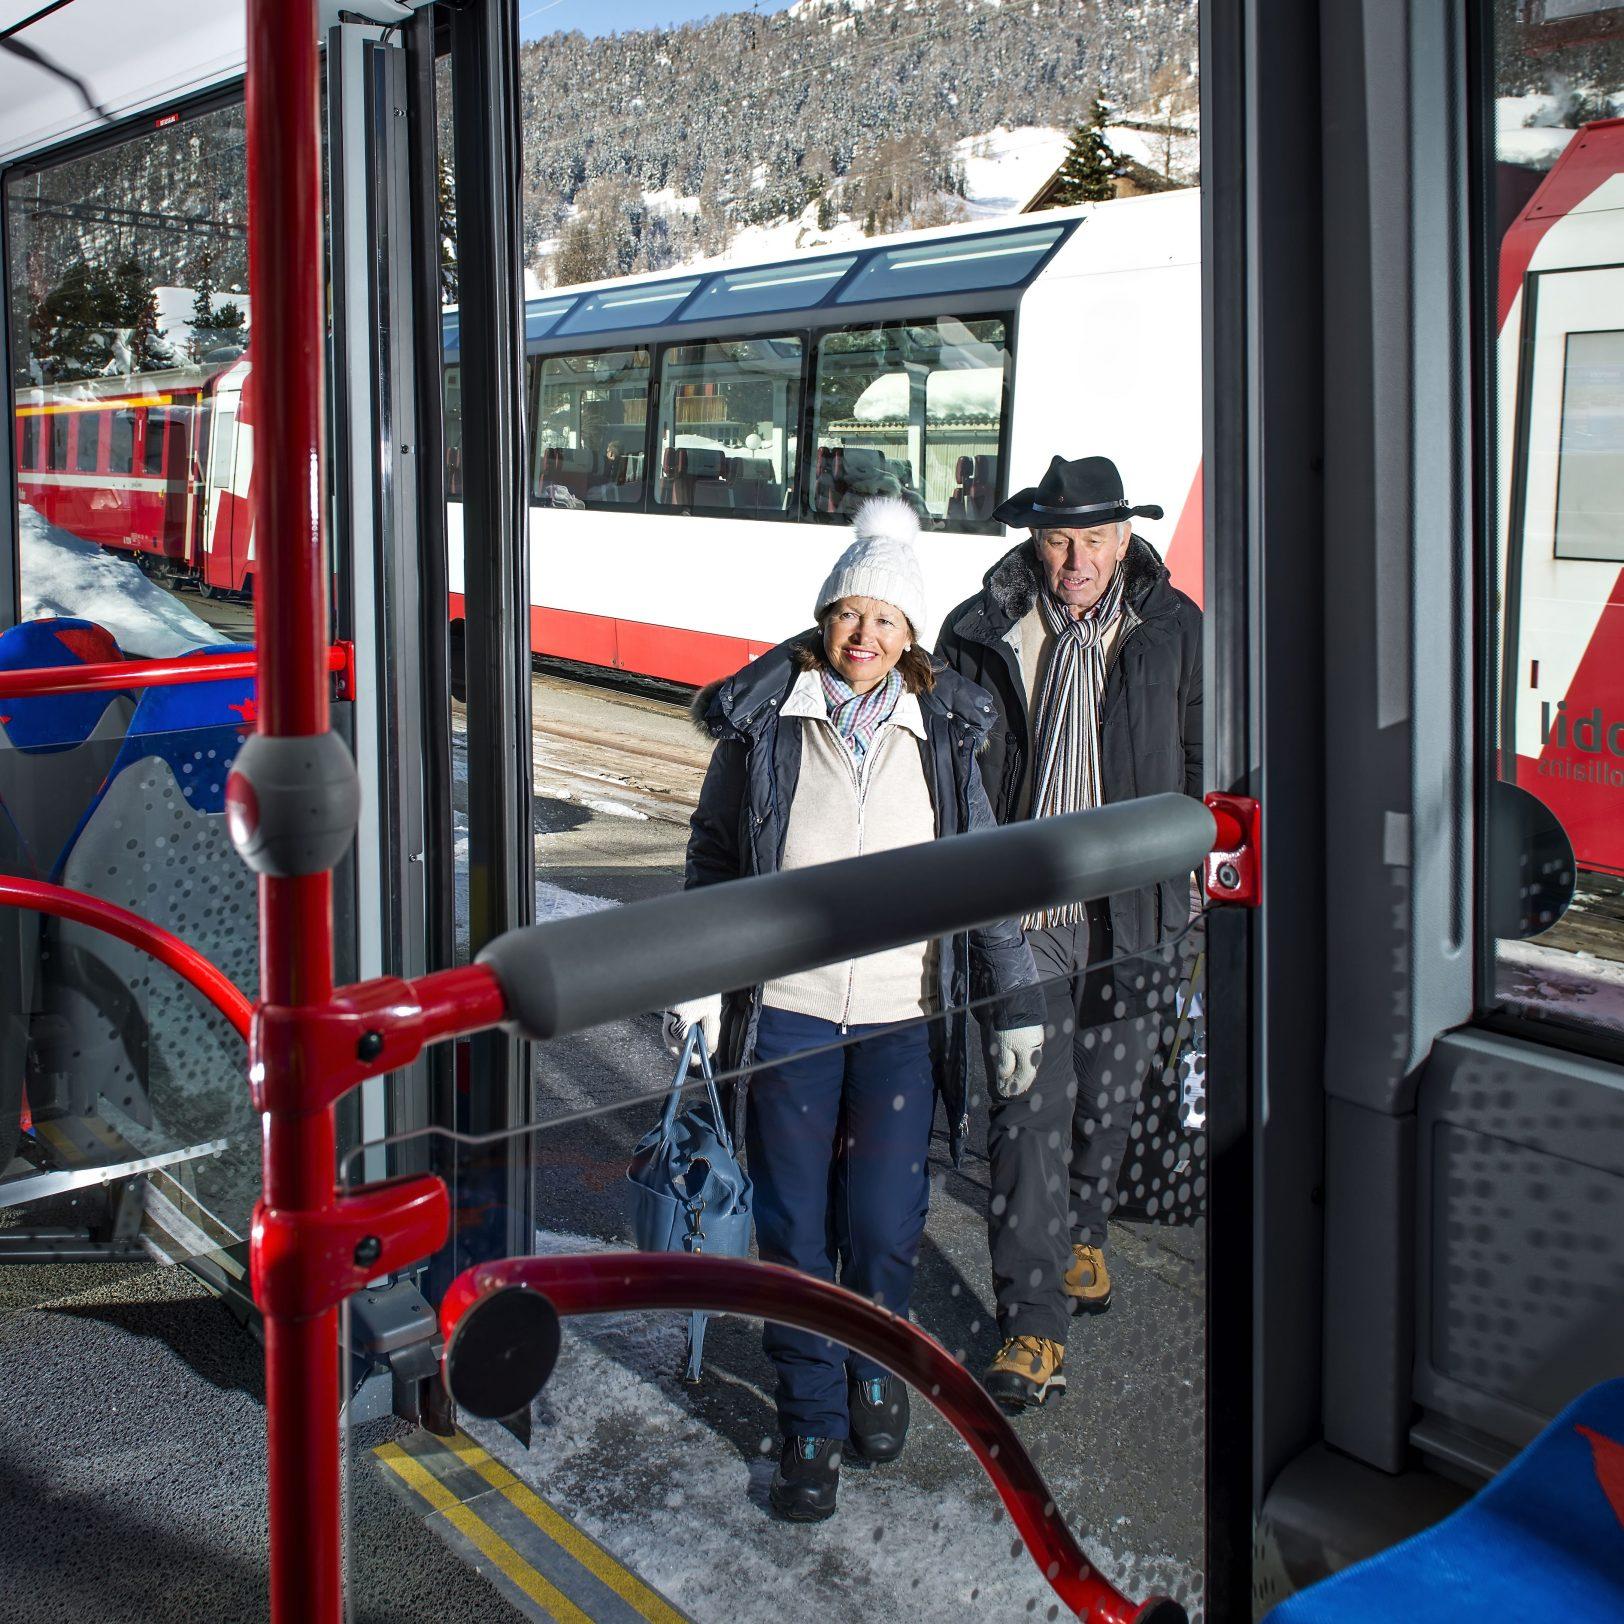 engadin-bus-umstieg-anschluss